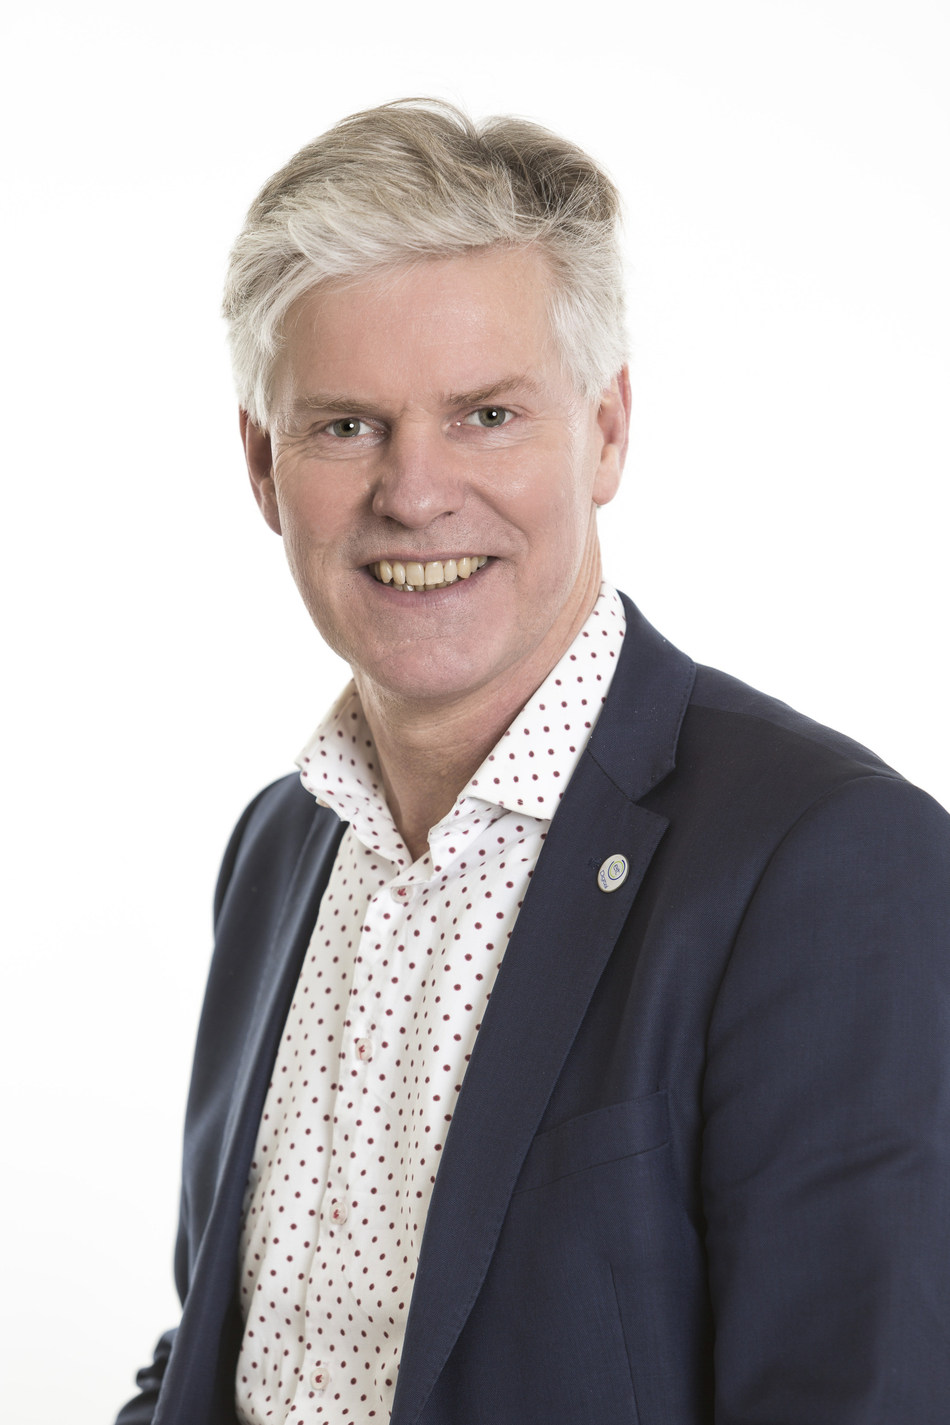 Willem Jonker, CEO EIT Digital (PRNewsfoto/EIT Digital)